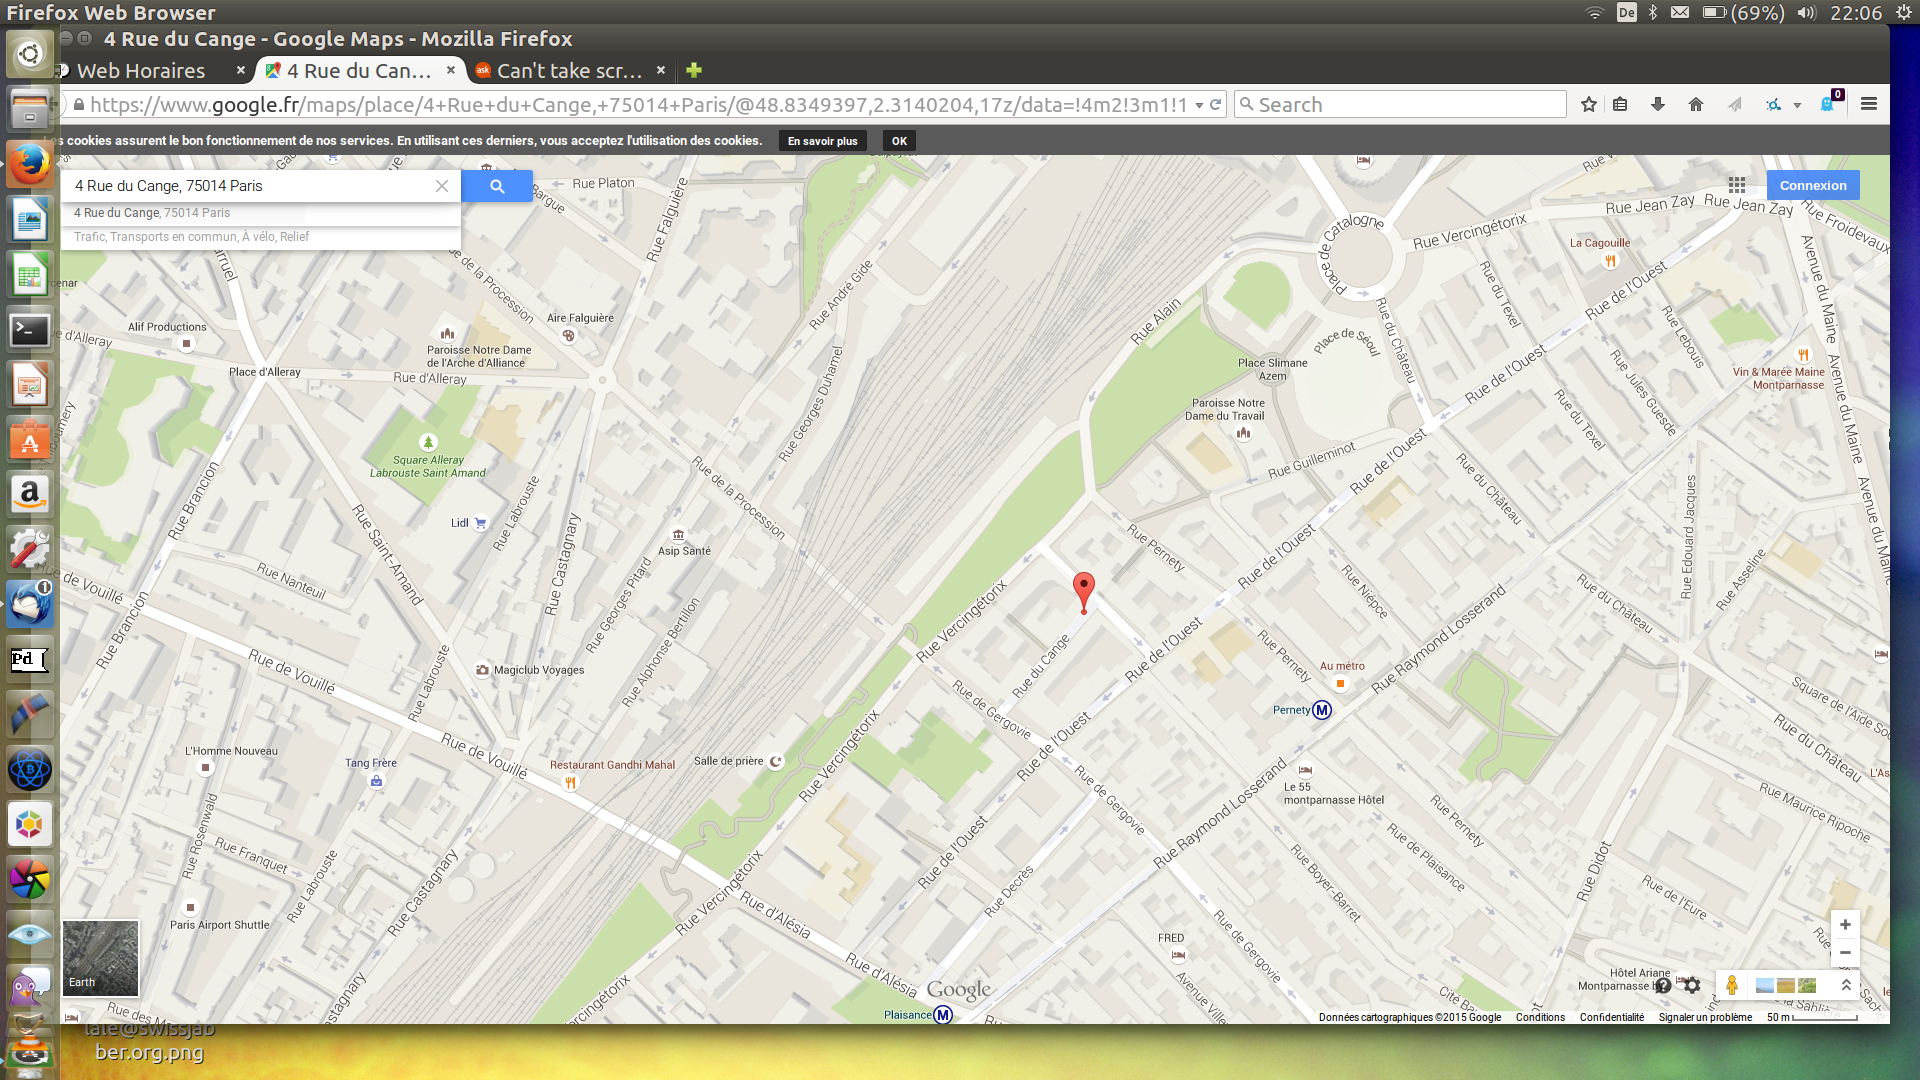 150709_Screenshot_Gare_Montparnasse_Rue du Cange_Paris